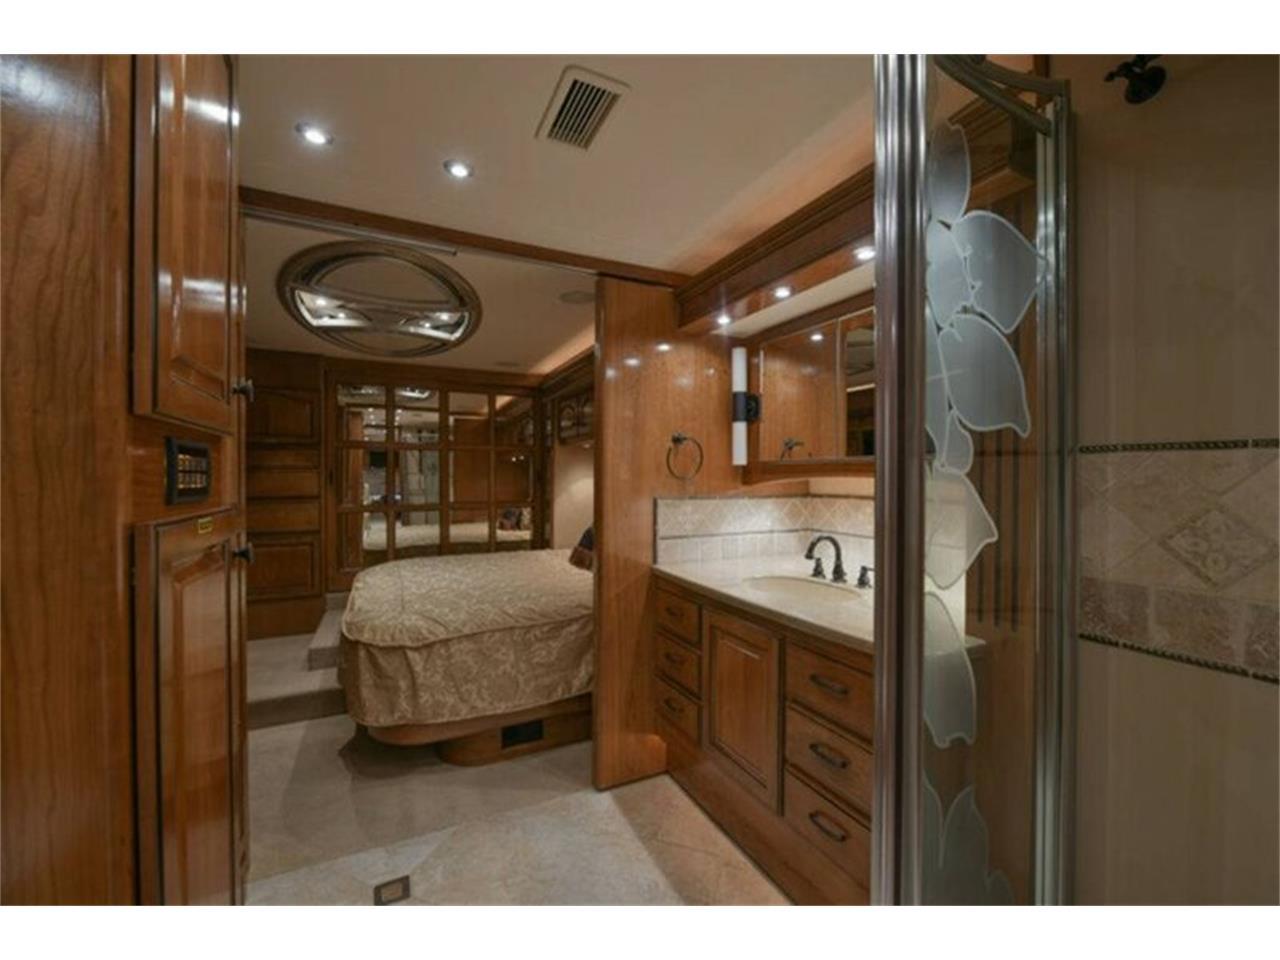 2009 Country Coach Magna (CC-1309995) for sale in Anaheim, California